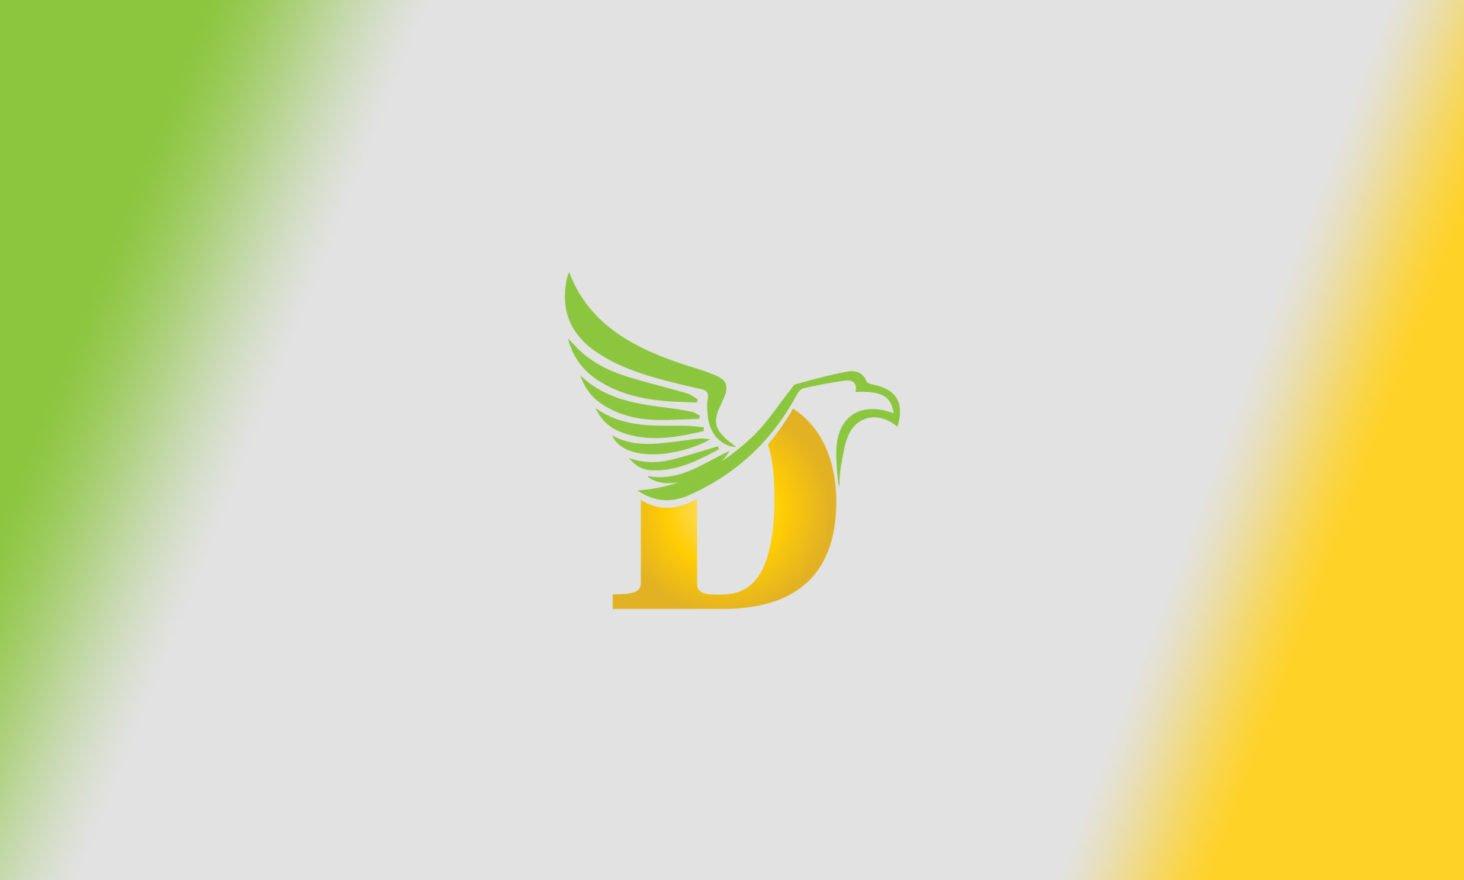 Dakuce - Secured International Cryptocurrency Exchange Platform